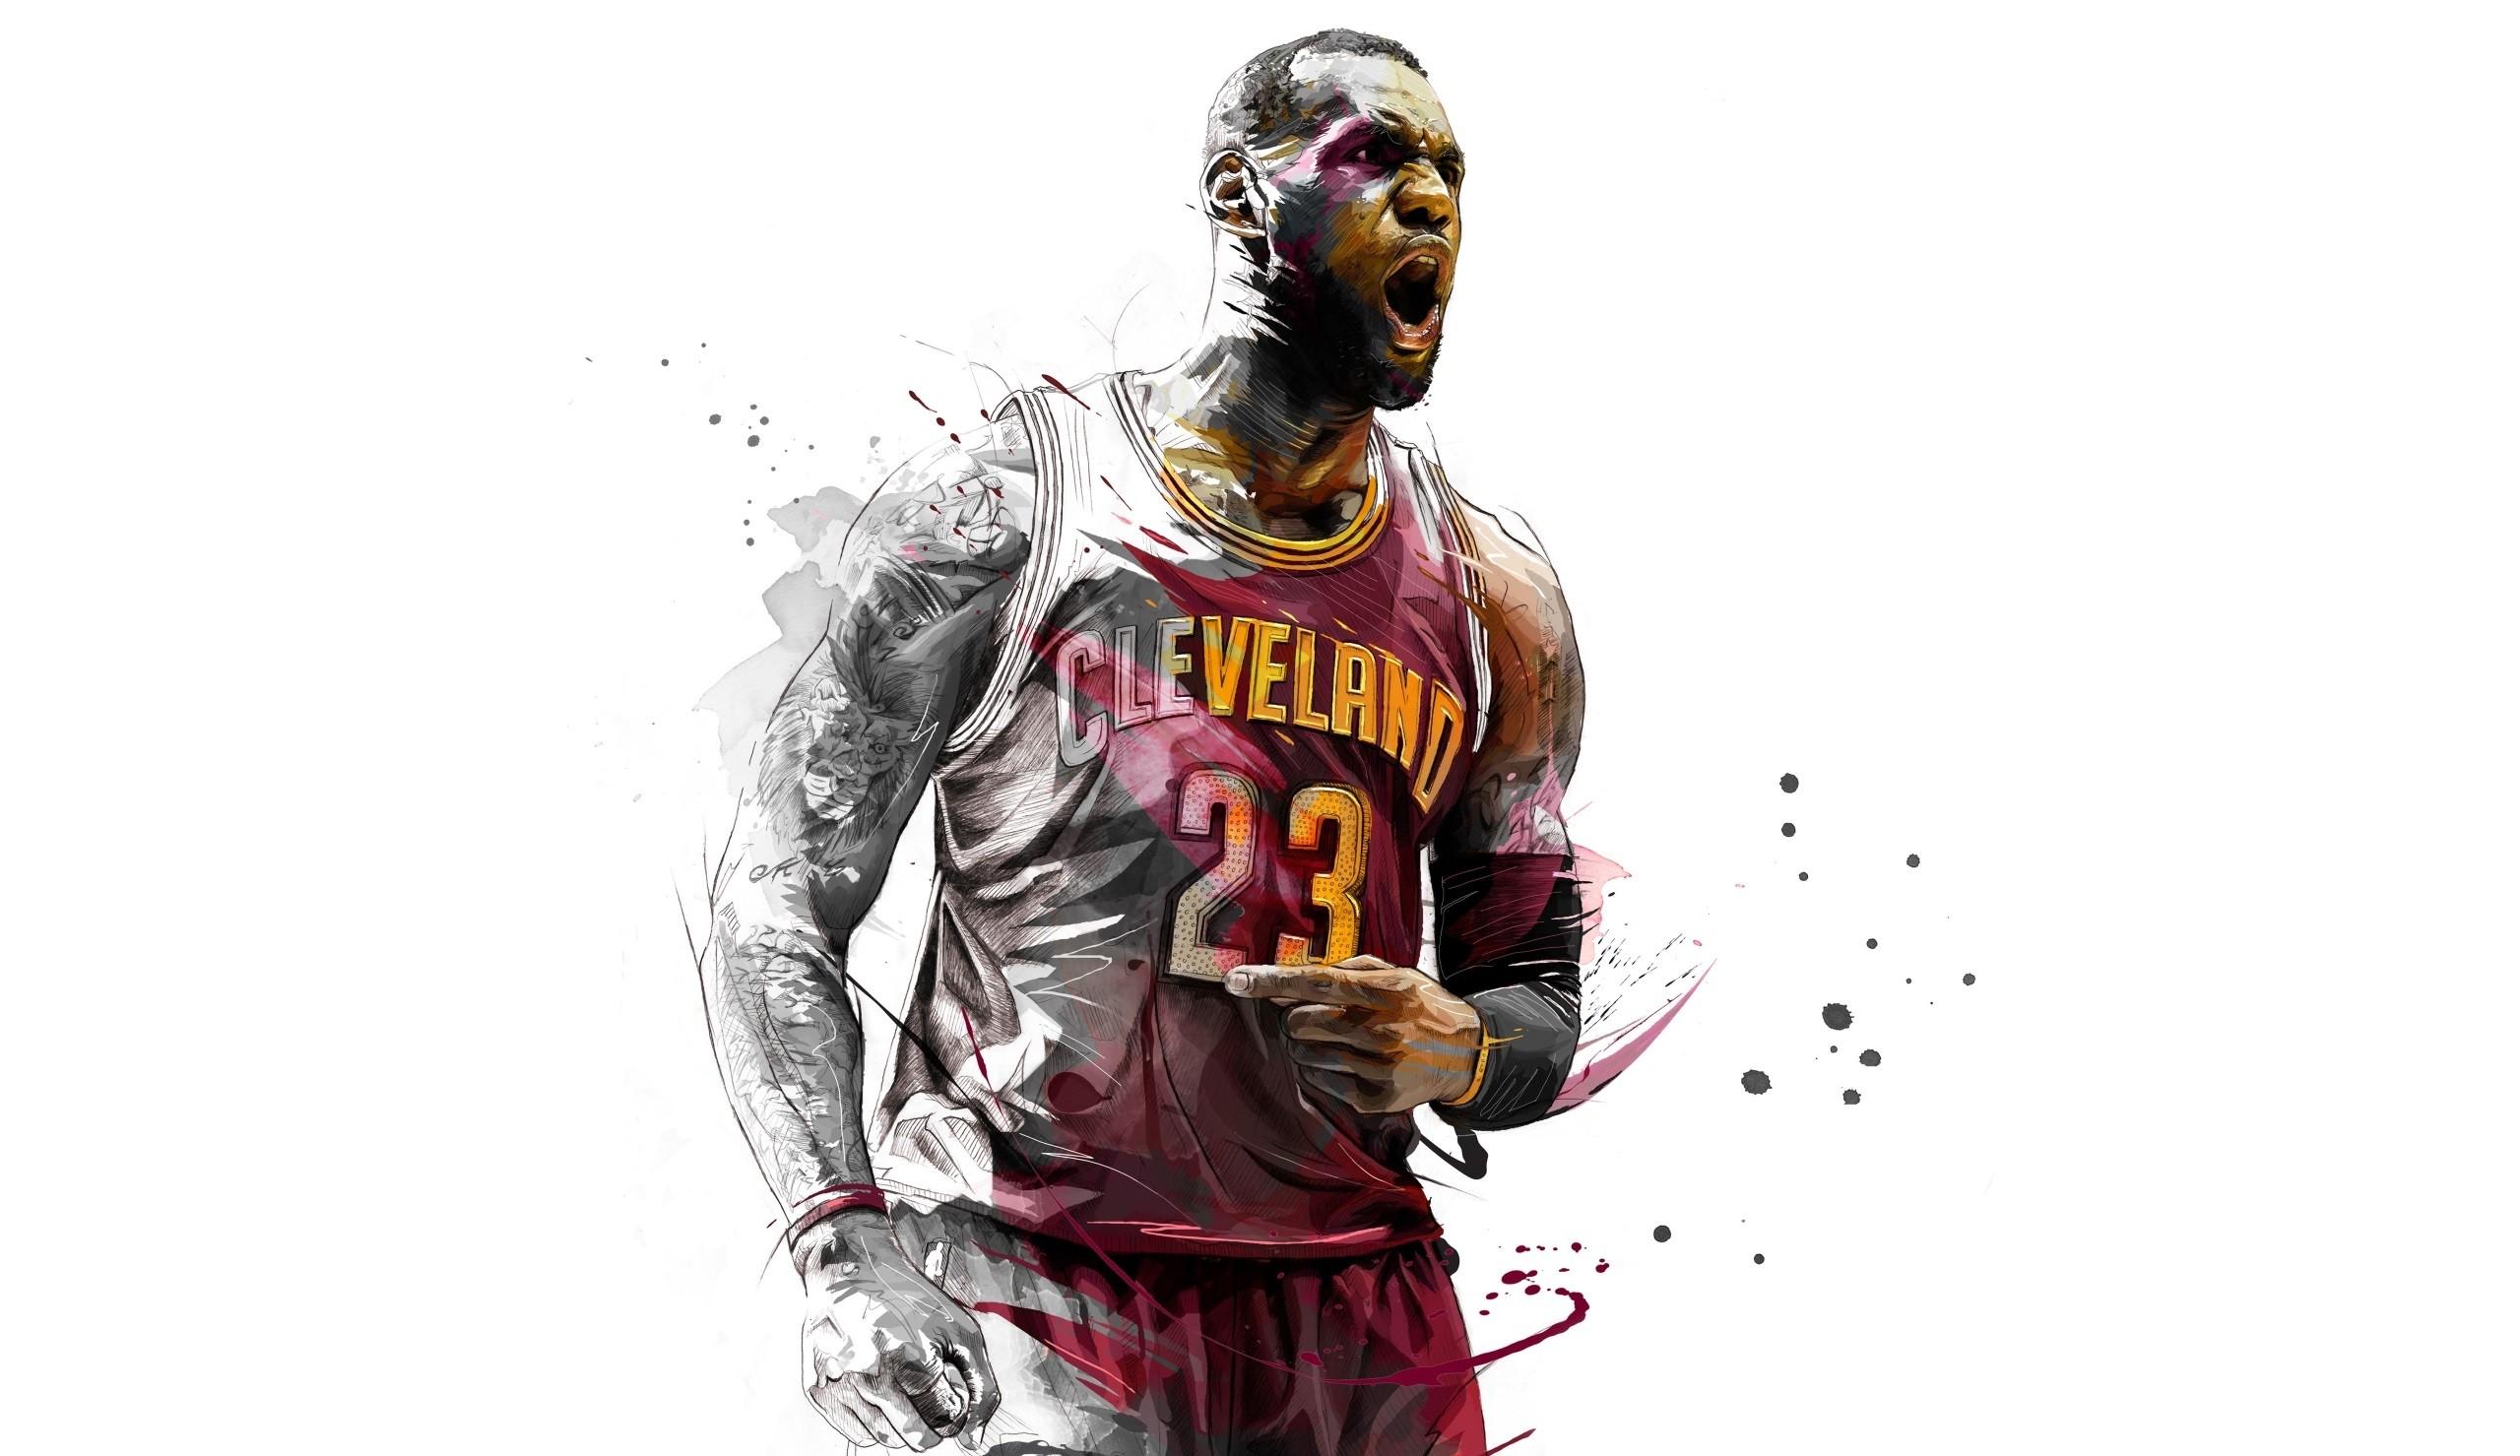 Атакующий защитник в баскетболе